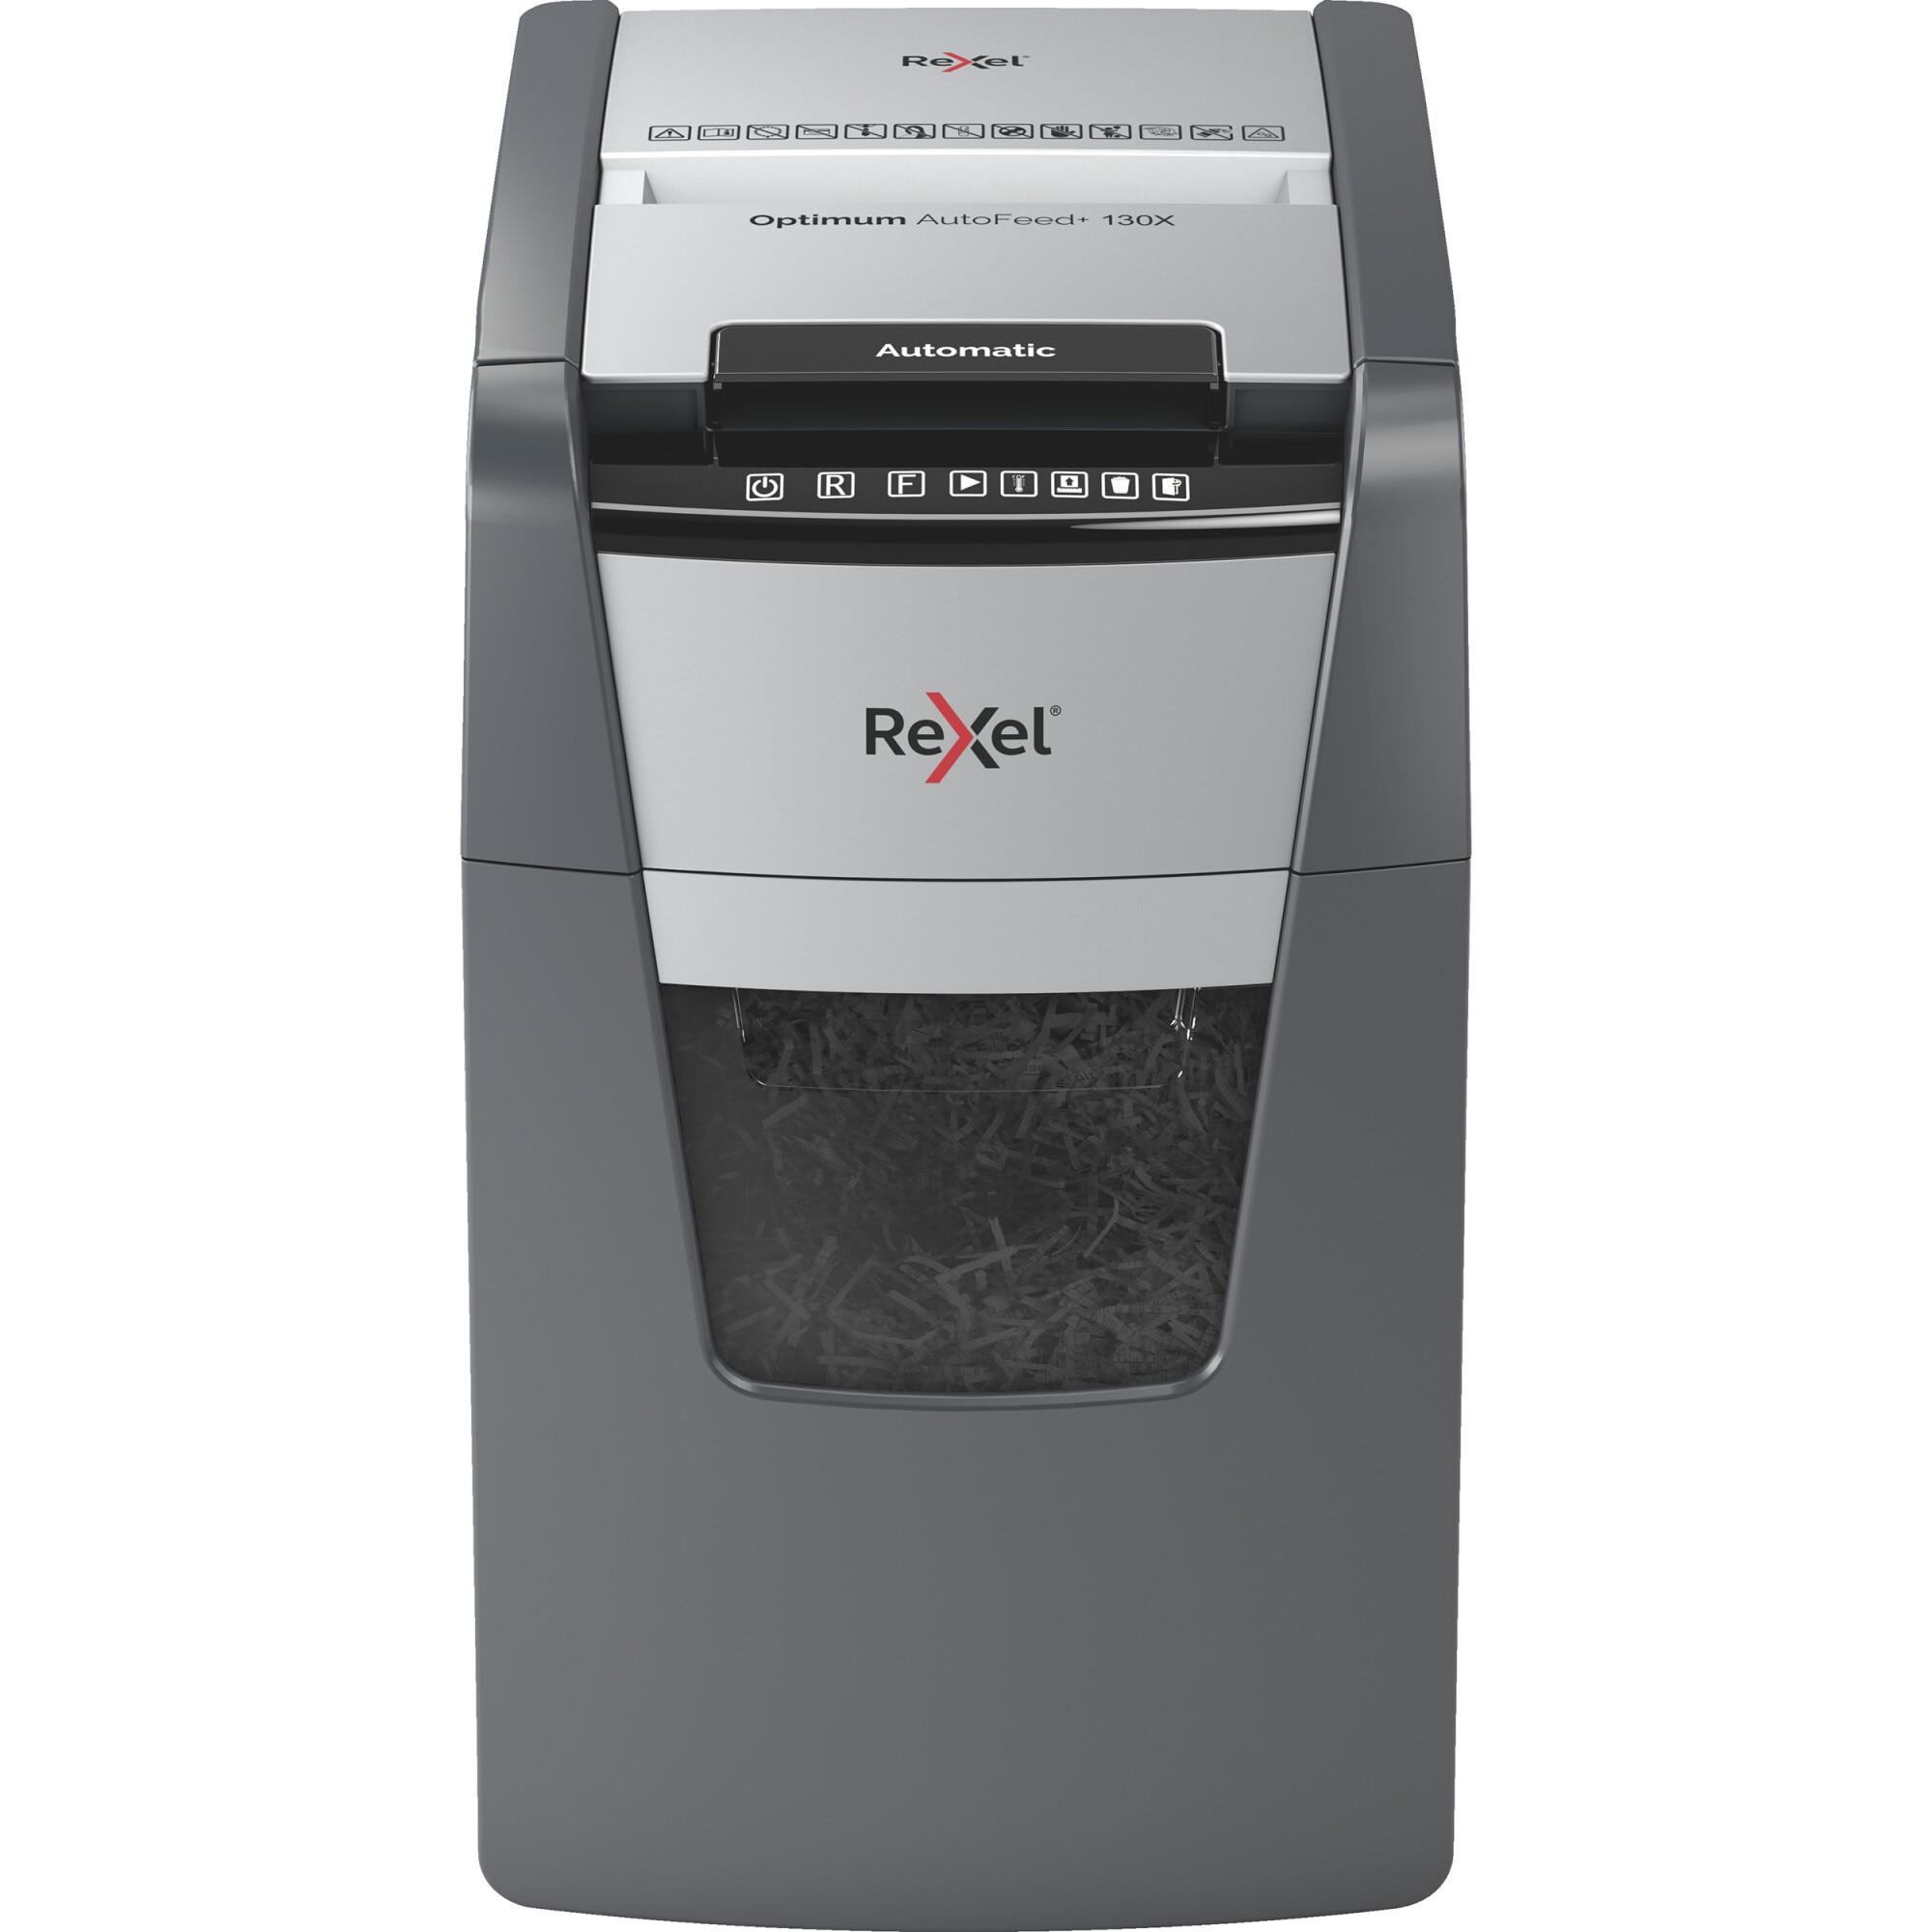 Fotografie Distrugator documente automat REXEL OPTIMUM 130X, P4, cross-cut (confeti), 130 coli, cos 44l, negru-gri